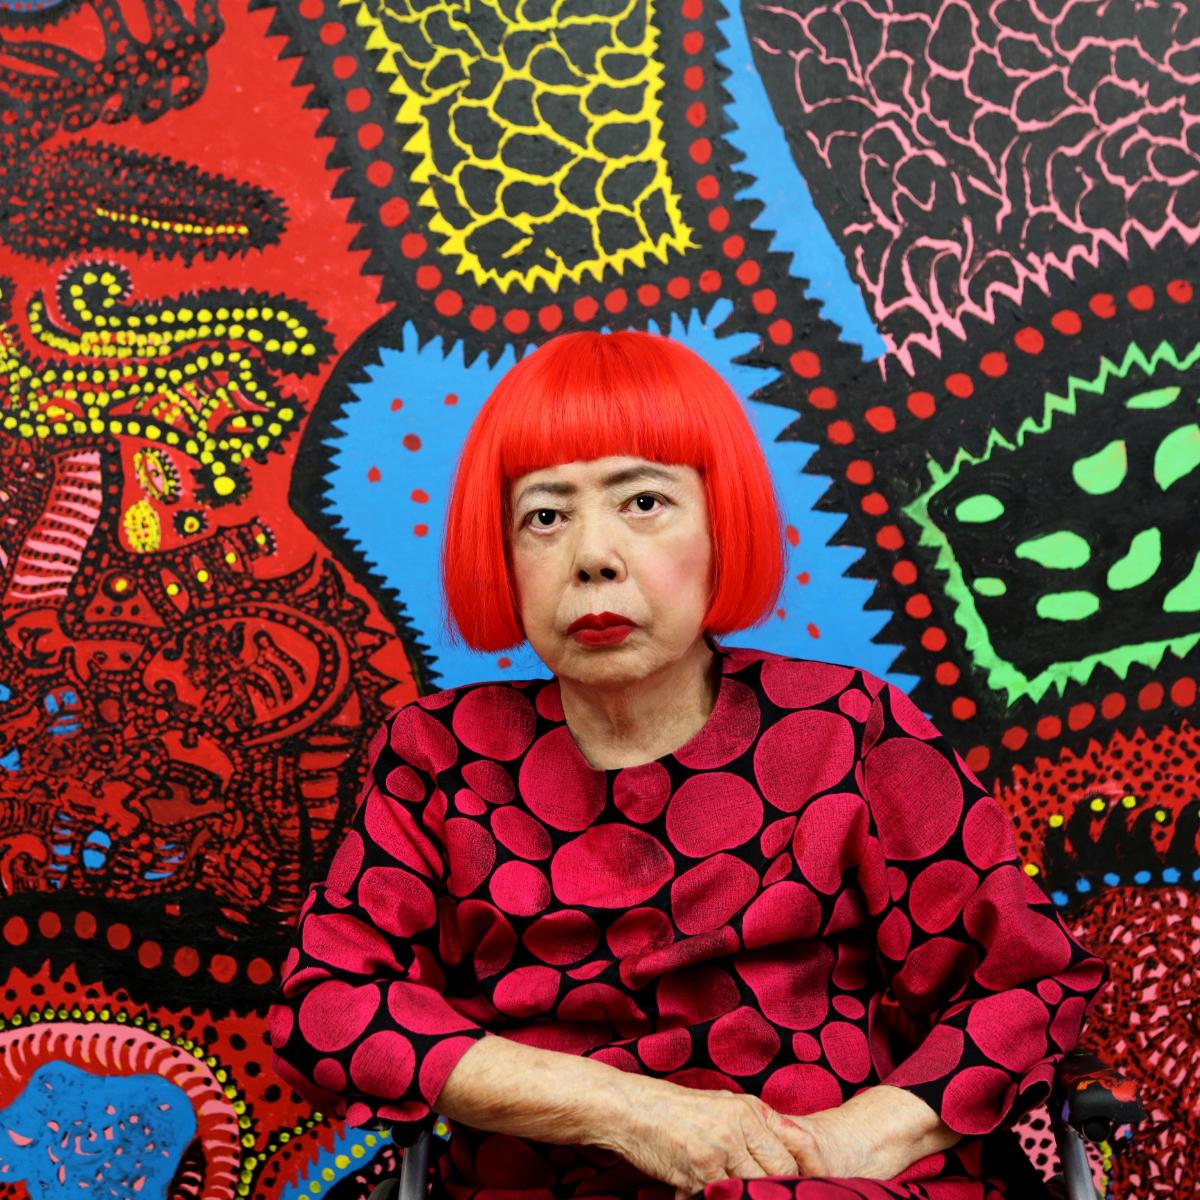 Yayoi Kusama, Portrait